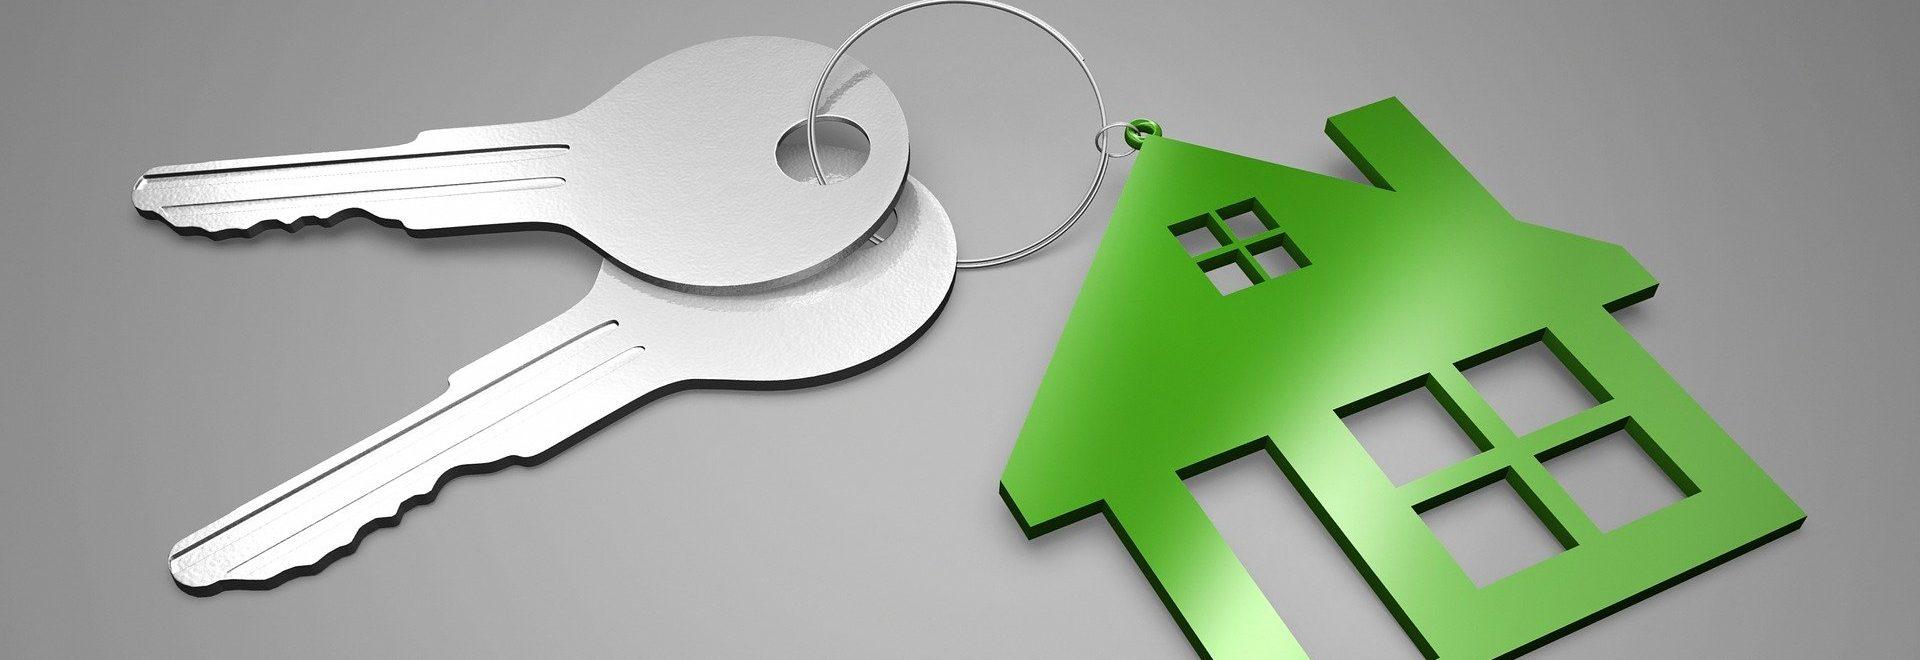 house-2368389_1920